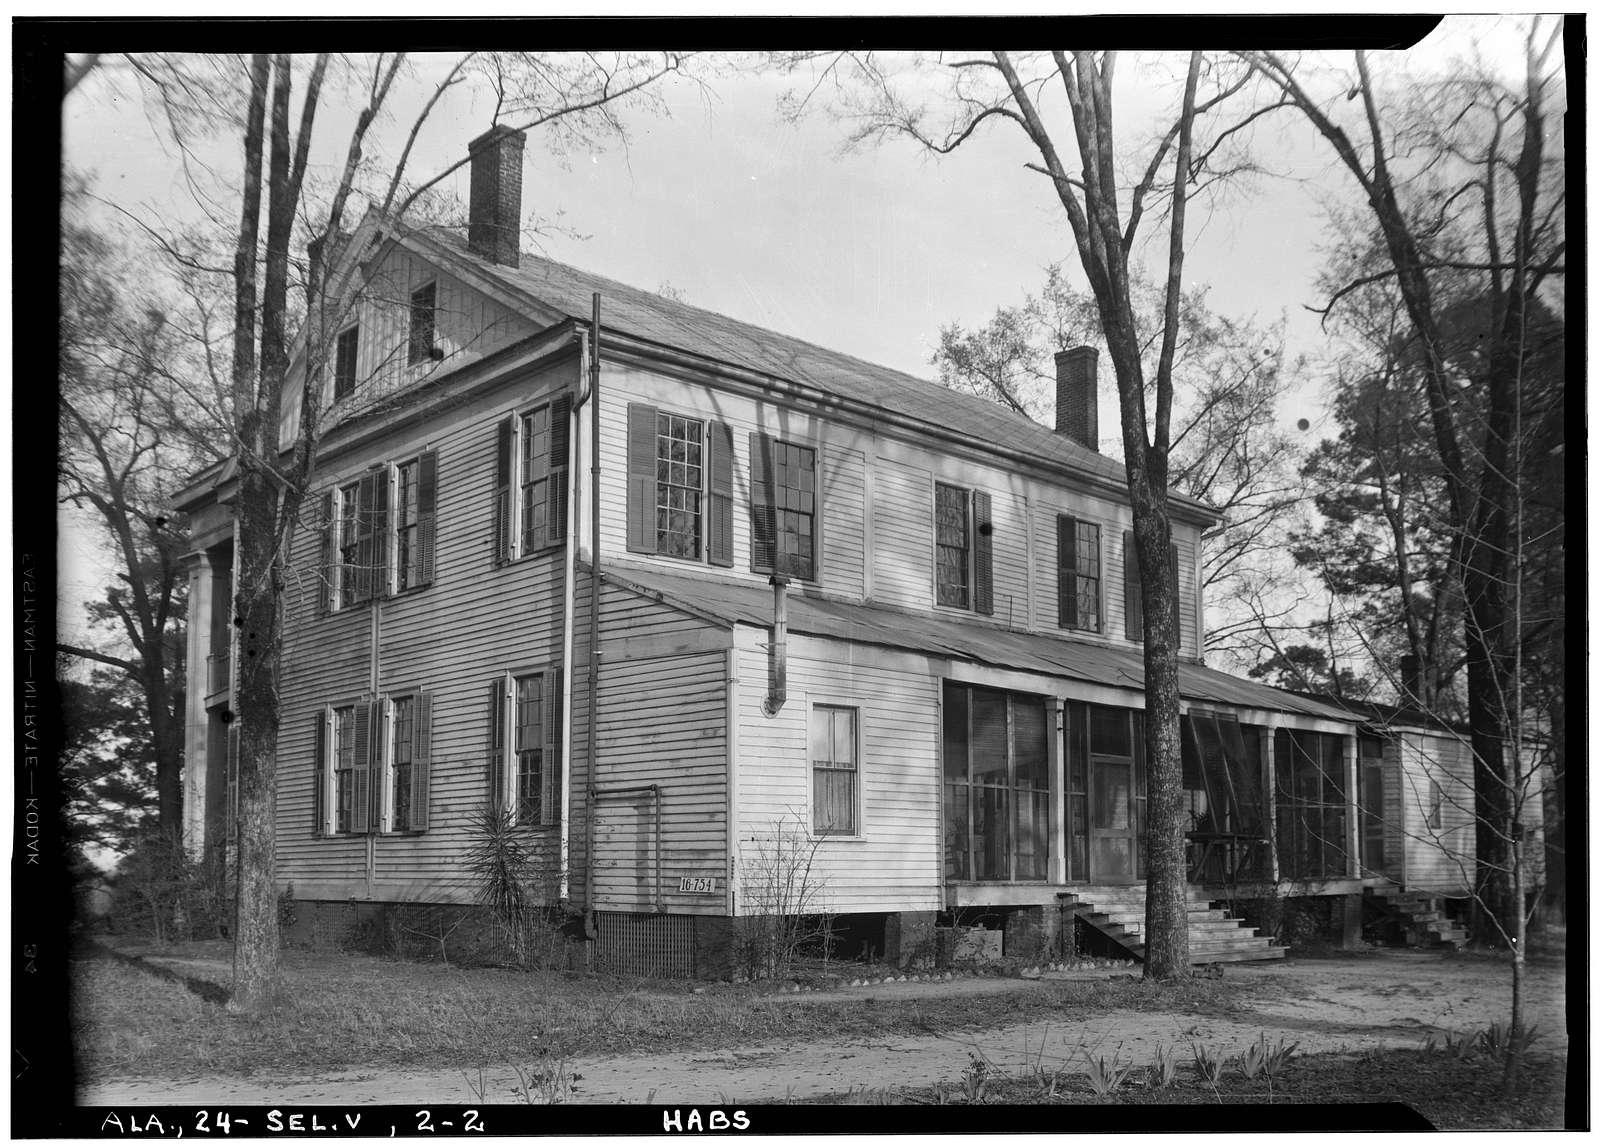 Doctor Harper House, State Highway 219 & County Road 344, Selma, Dallas County, AL